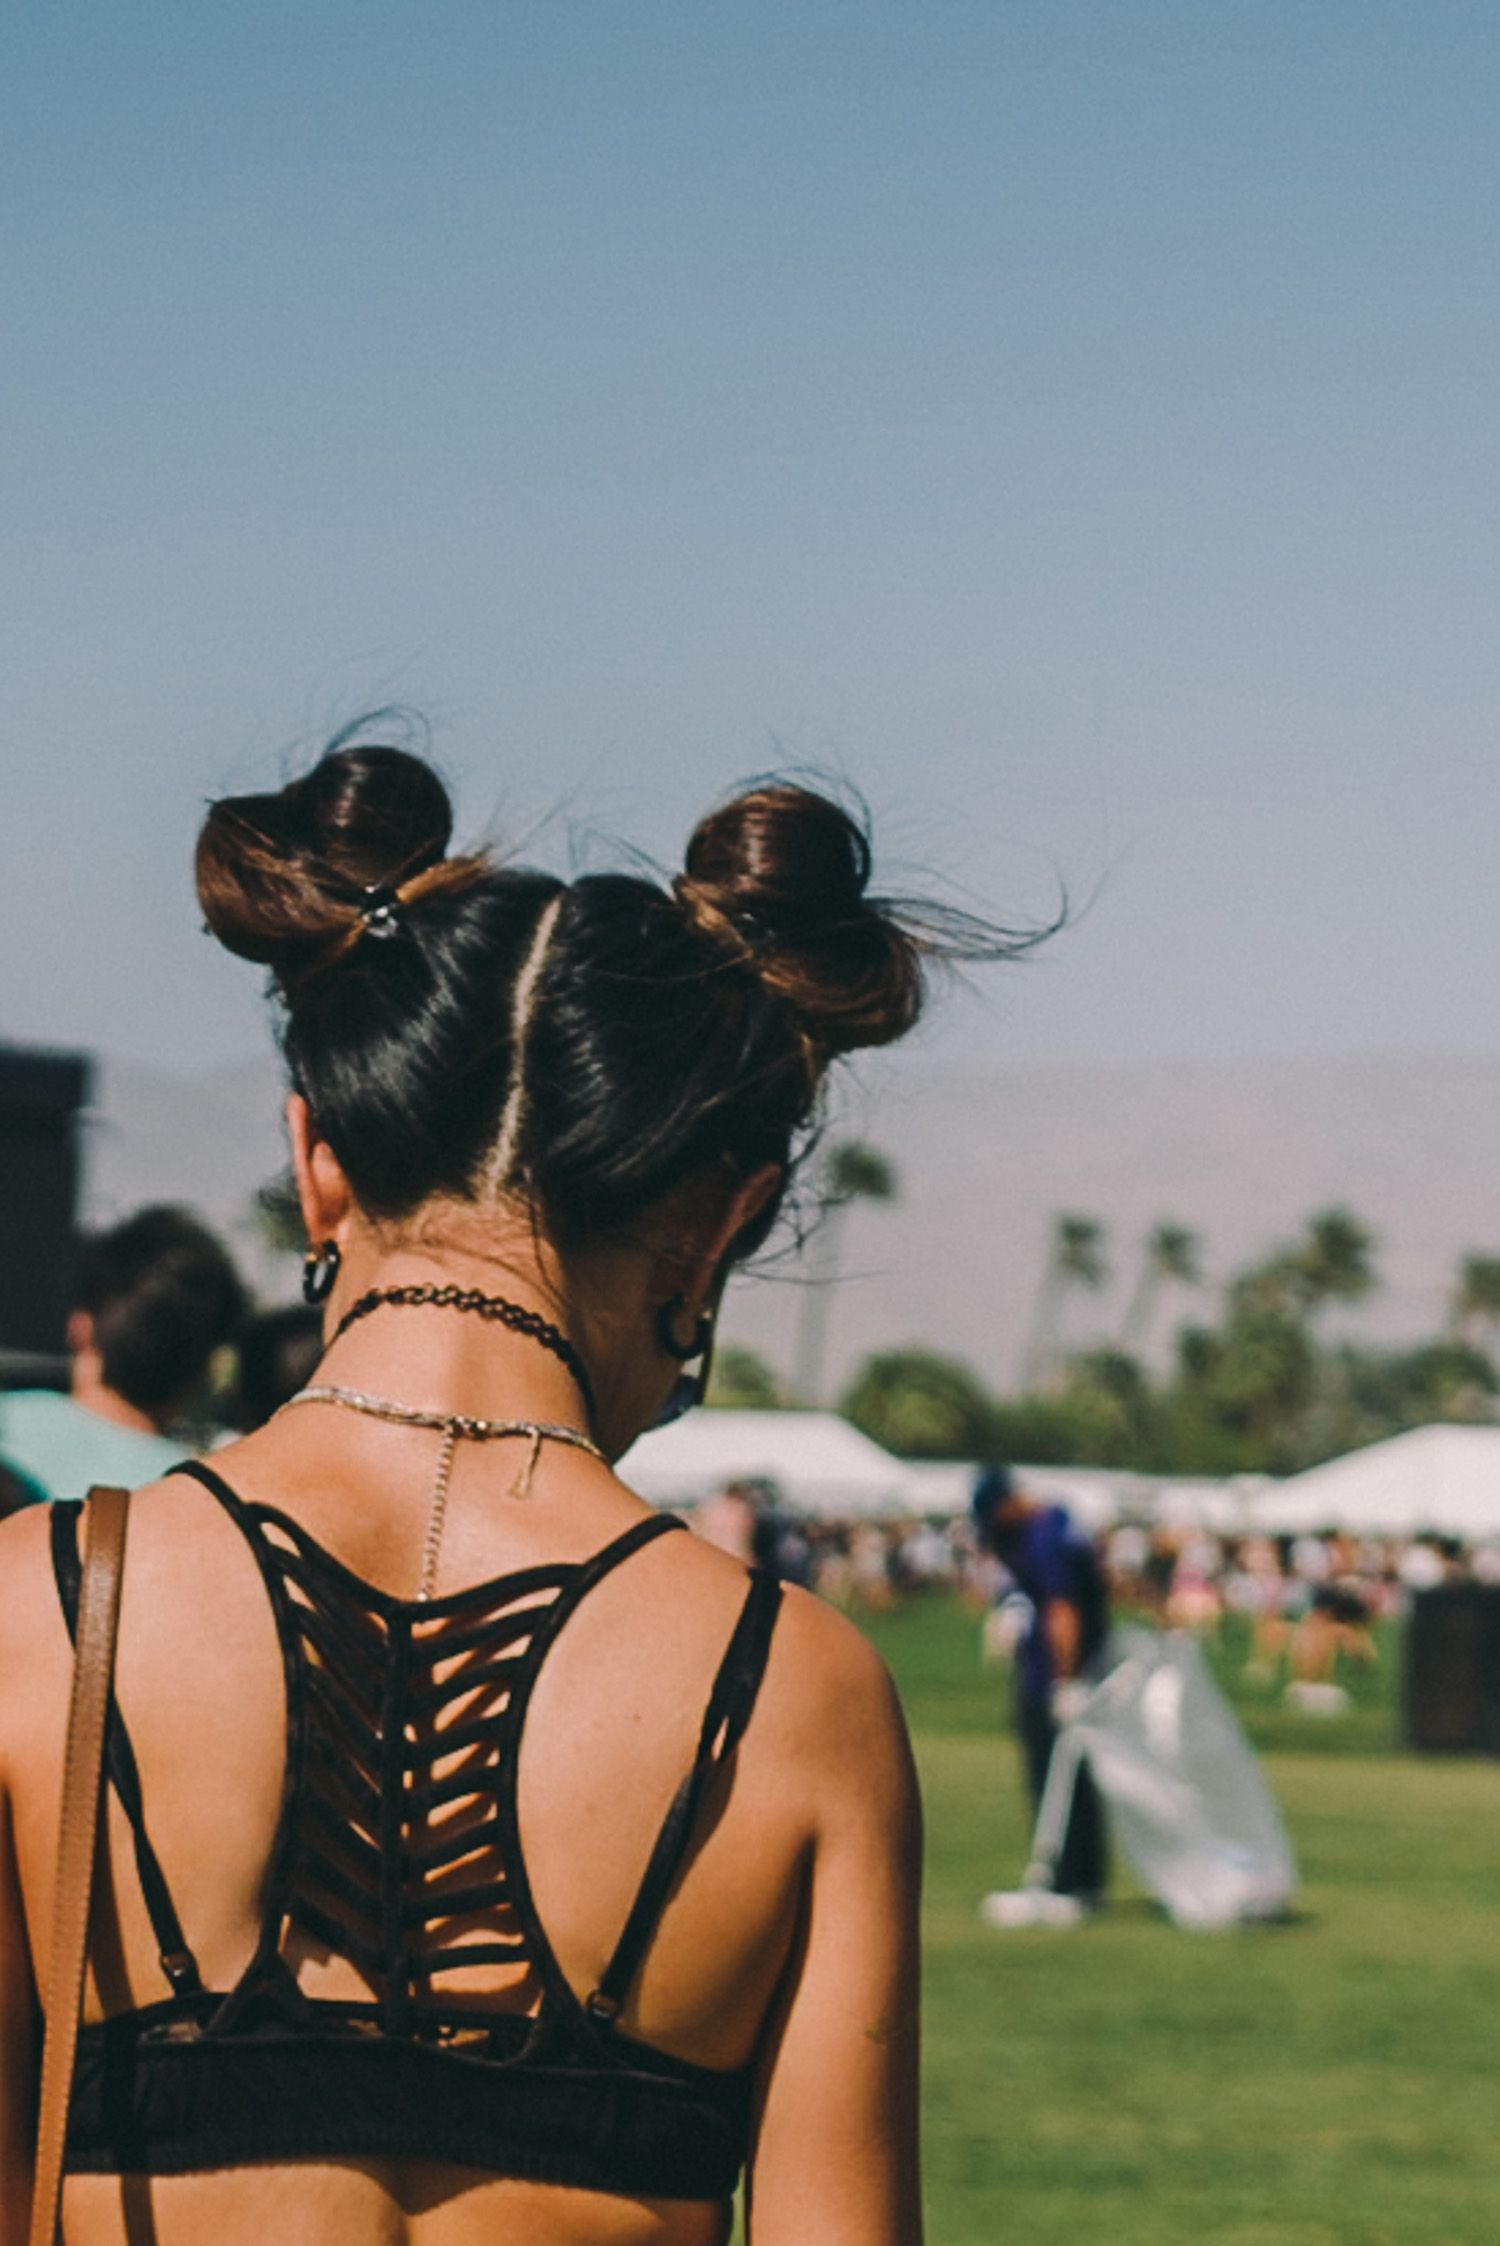 Beaverbrooks | Festival hair style Coachella 2016 #Beaverbrooks #FestivalSeasonStyle #FestivalHair